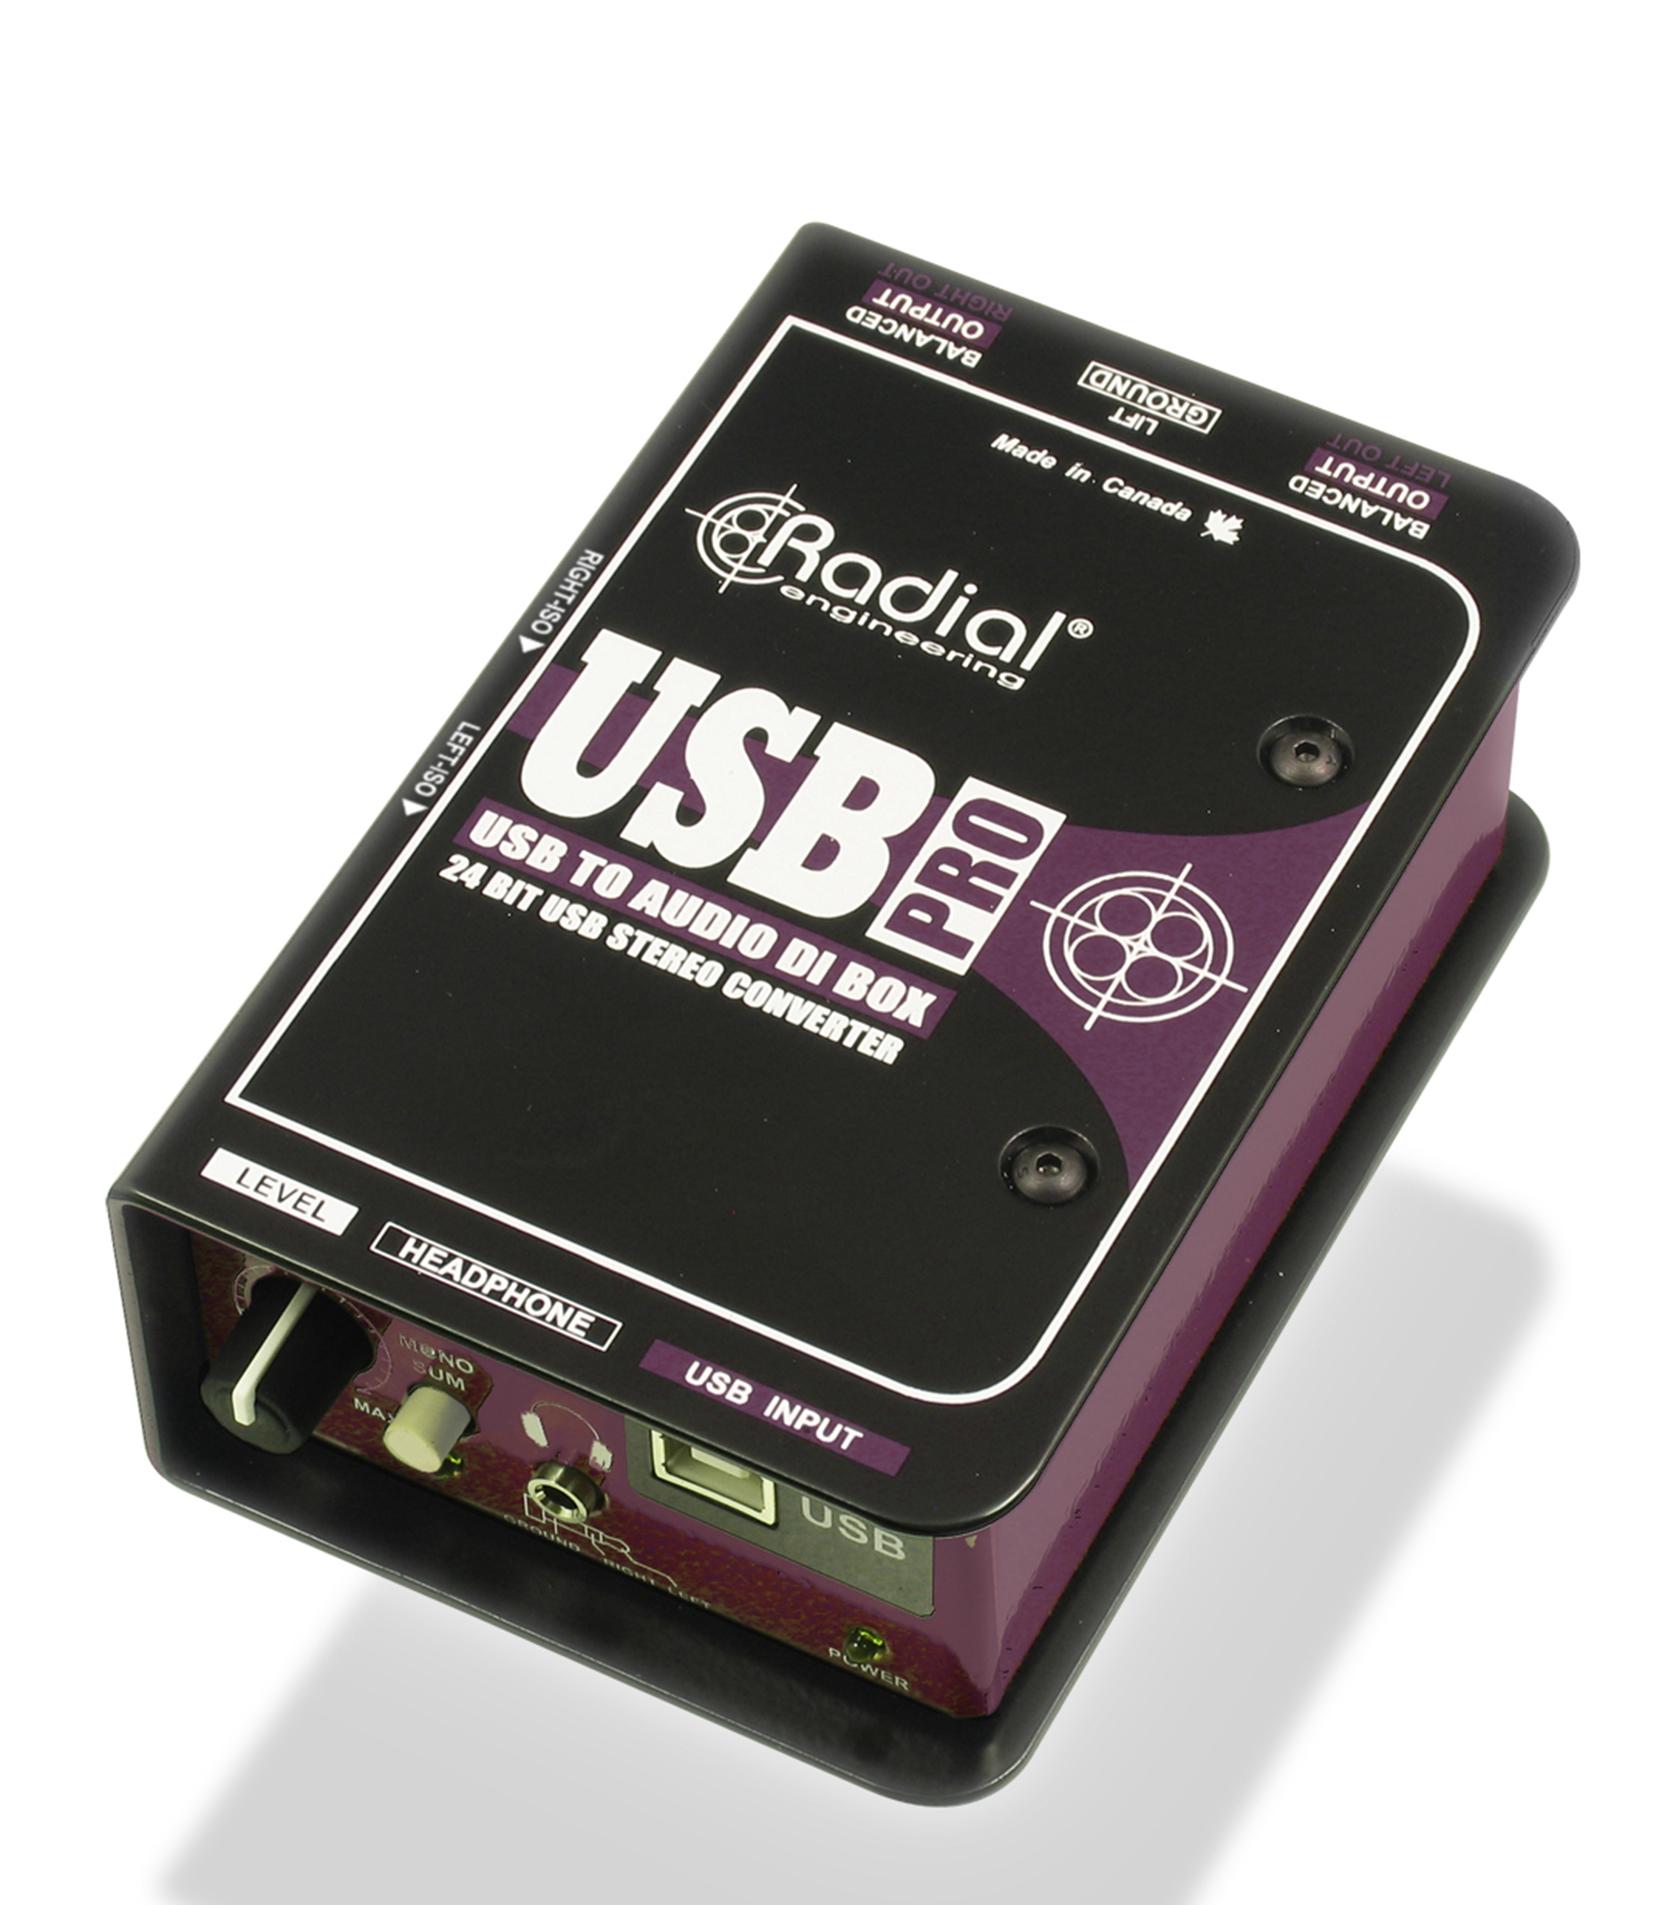 USB Pro - Buy Online